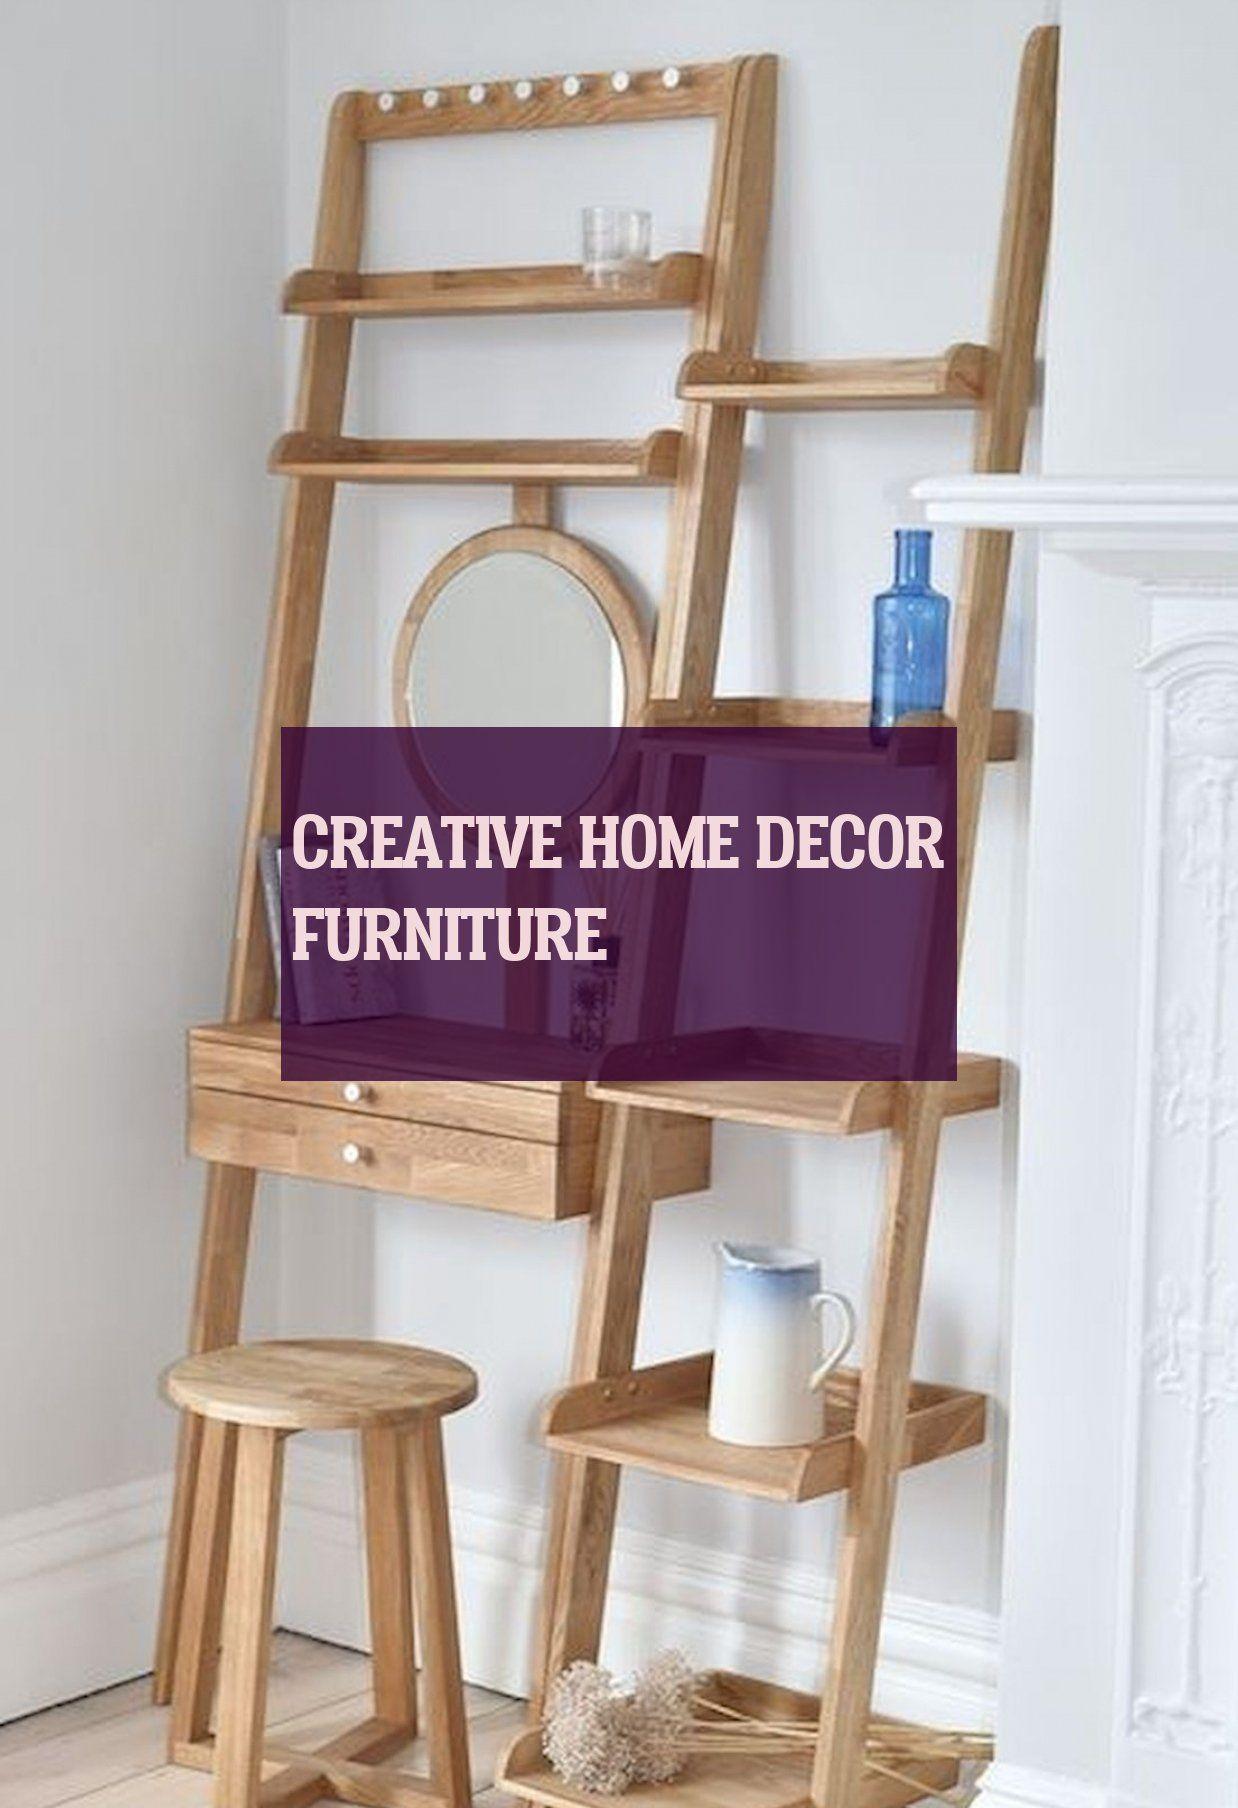 Creative Home Decor Furniture Kreative Wohnkultur Möbel